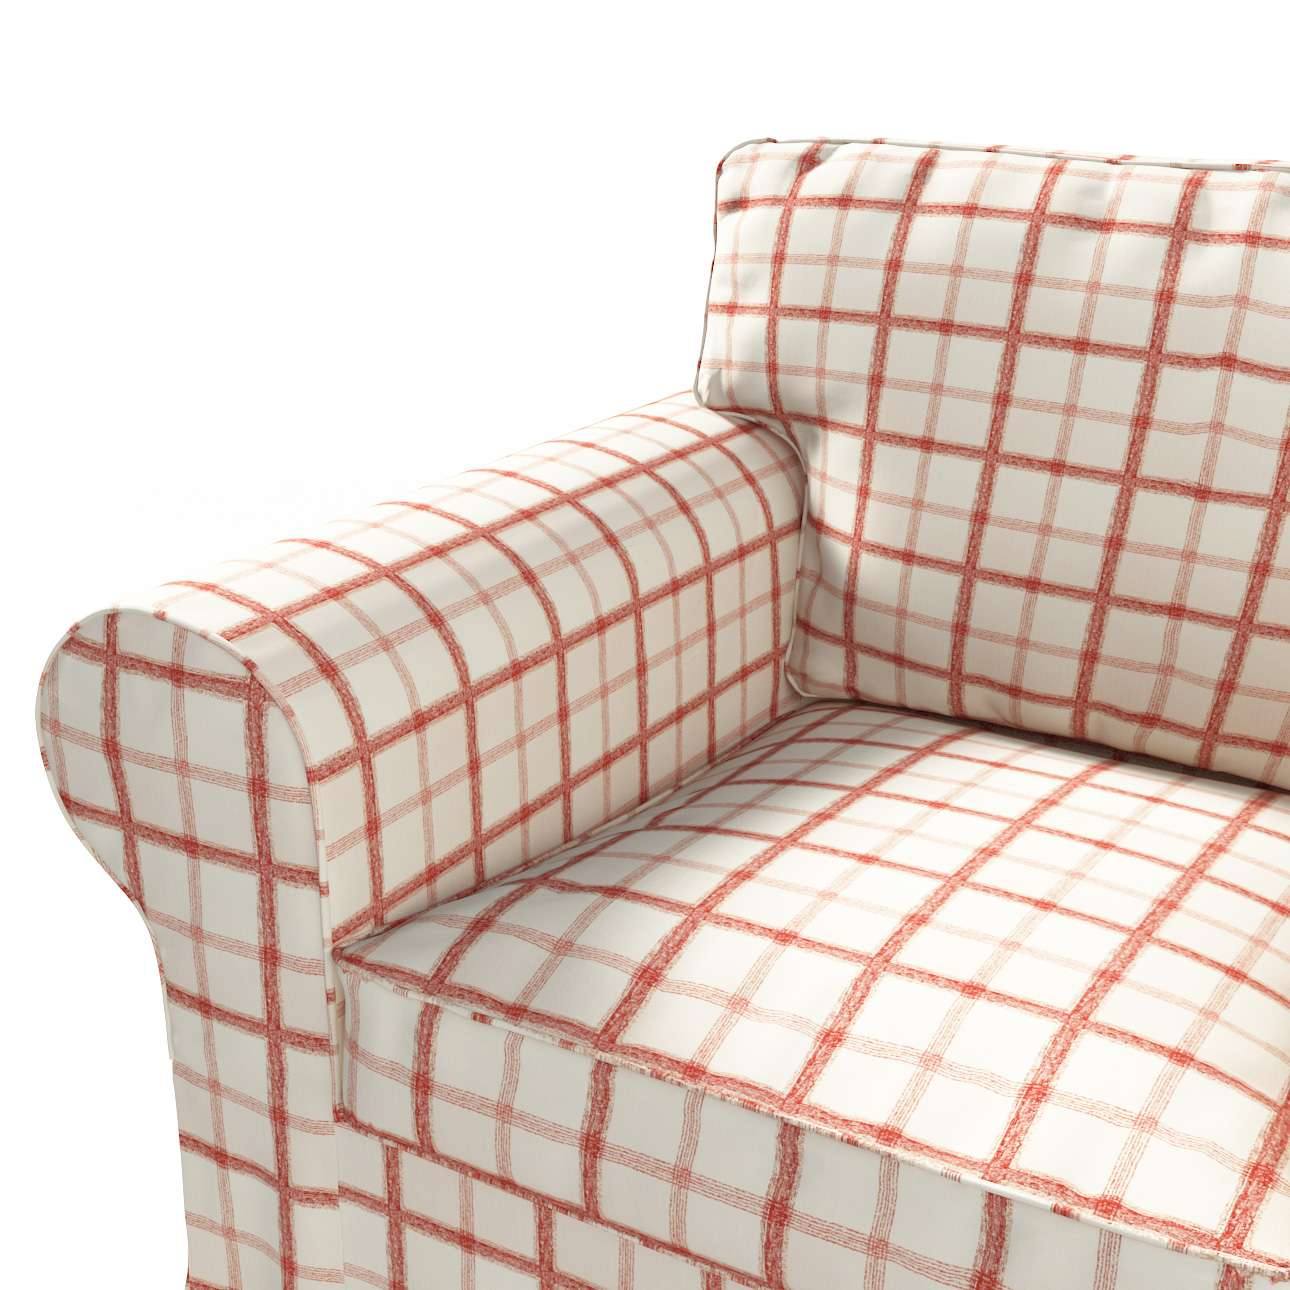 Ektorp Sesselbezug Sesselhusse, Ektorp Sessel von der Kollektion Avinon, Stoff: 131-15